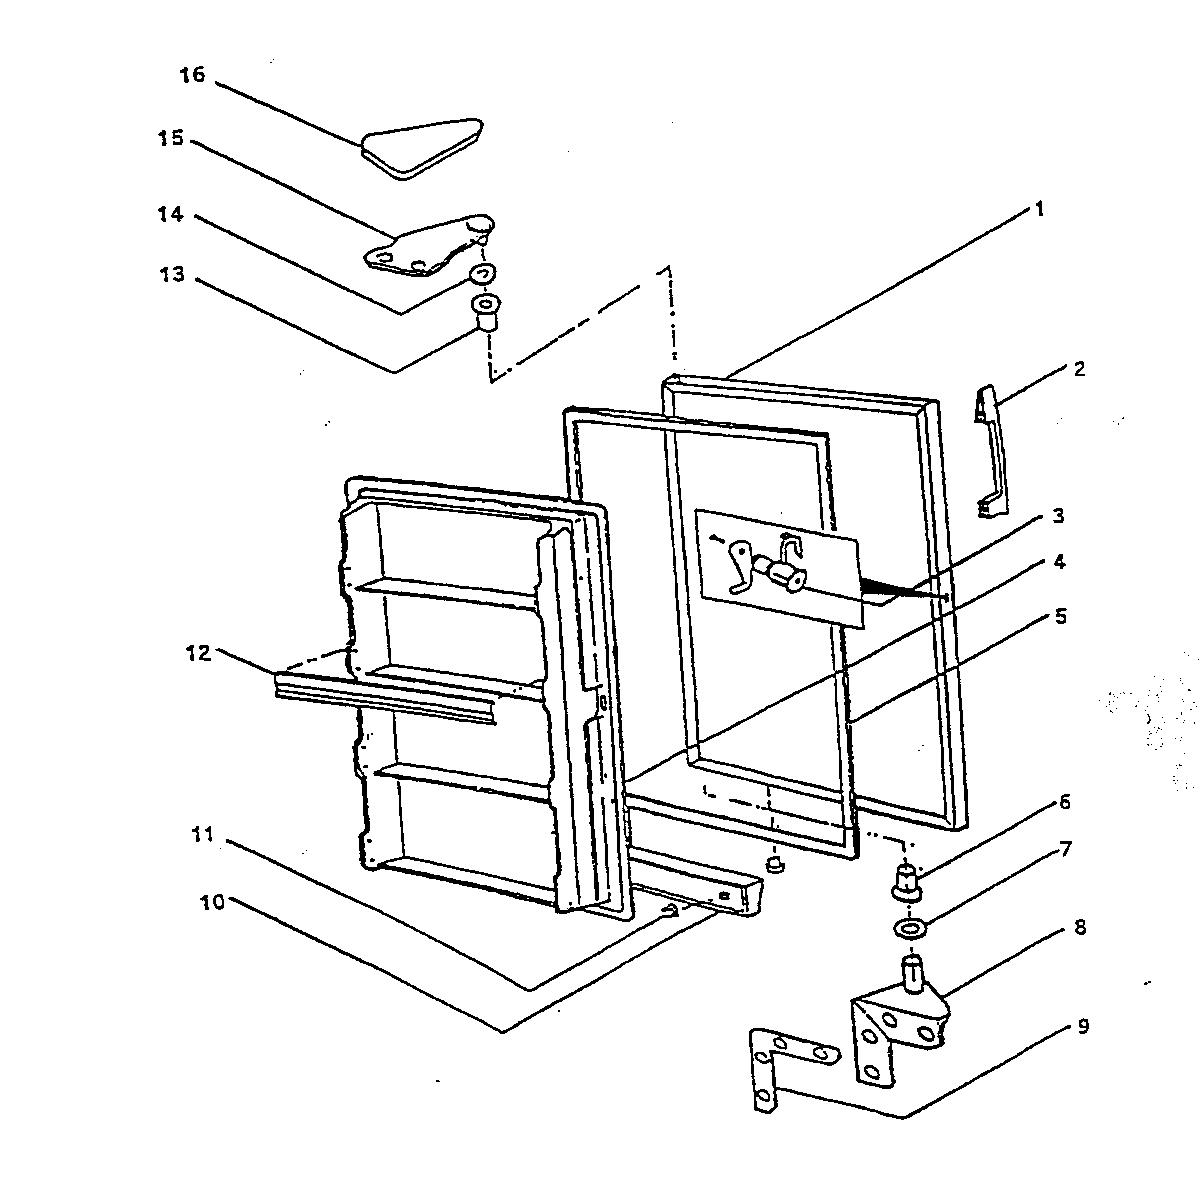 Wc-Wood model V1813RW3 upright freezer genuine parts